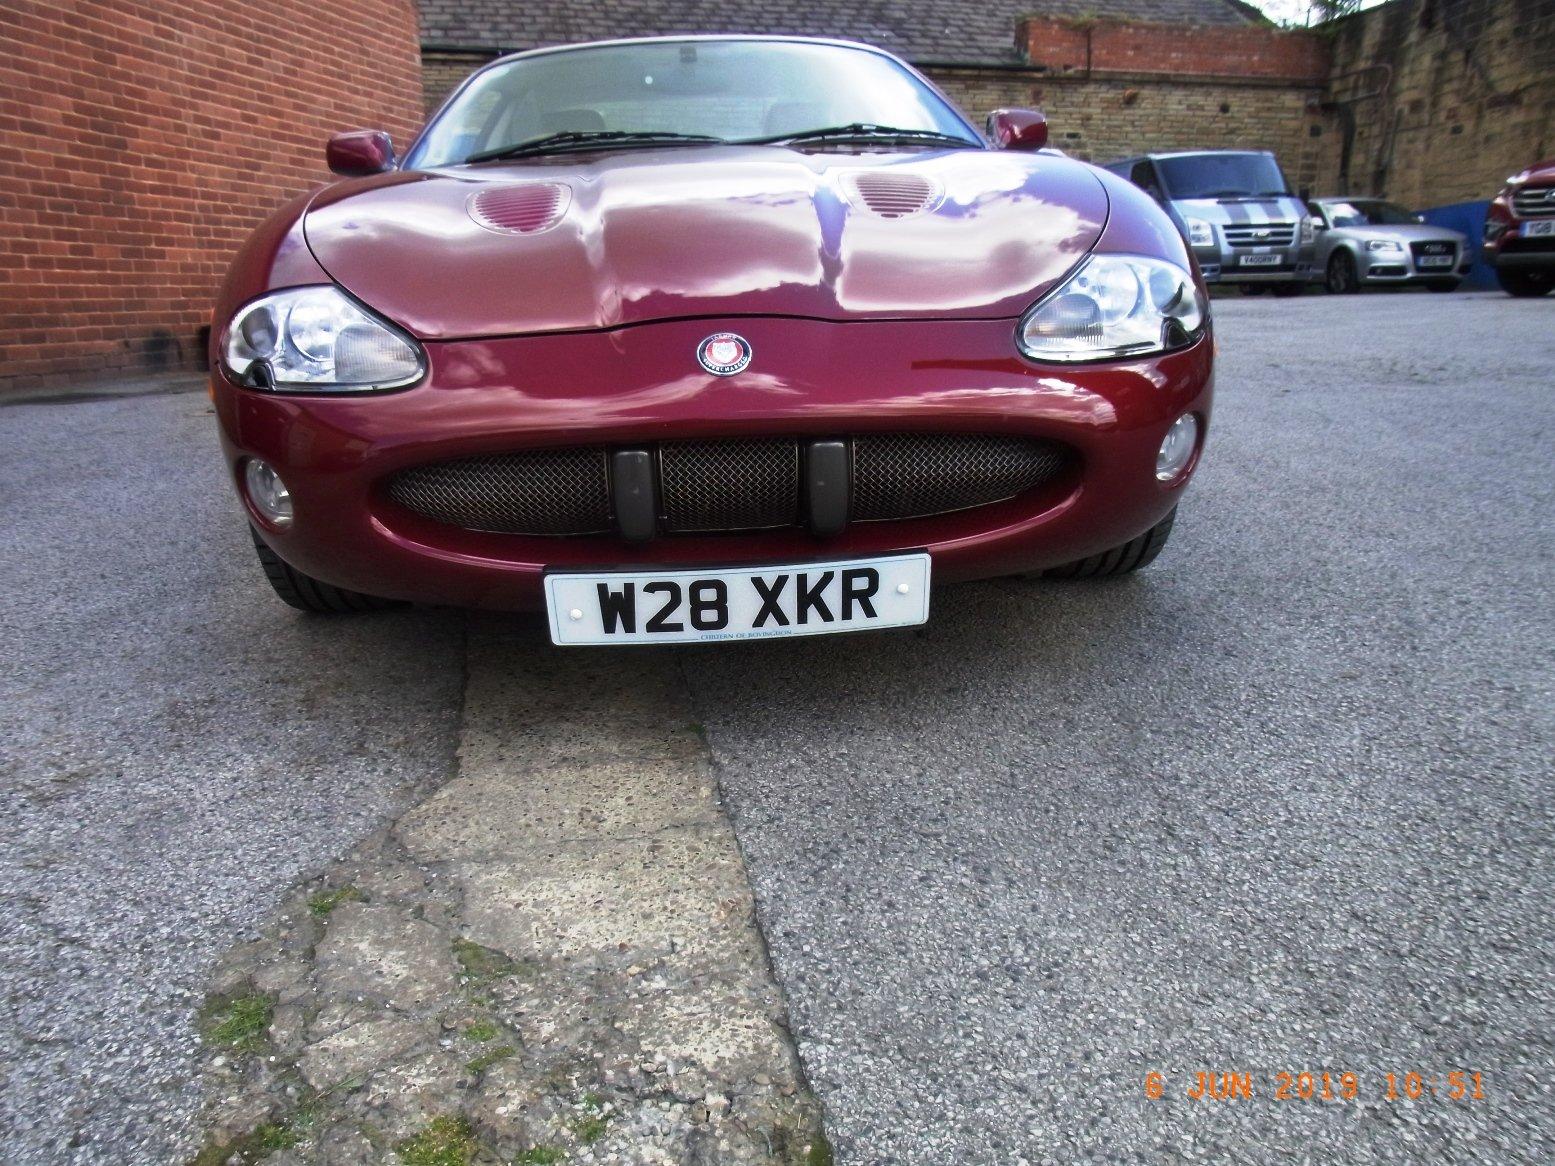 2002 Jaguar XKR 4.00 Litre Coupe For Sale (picture 3 of 6)